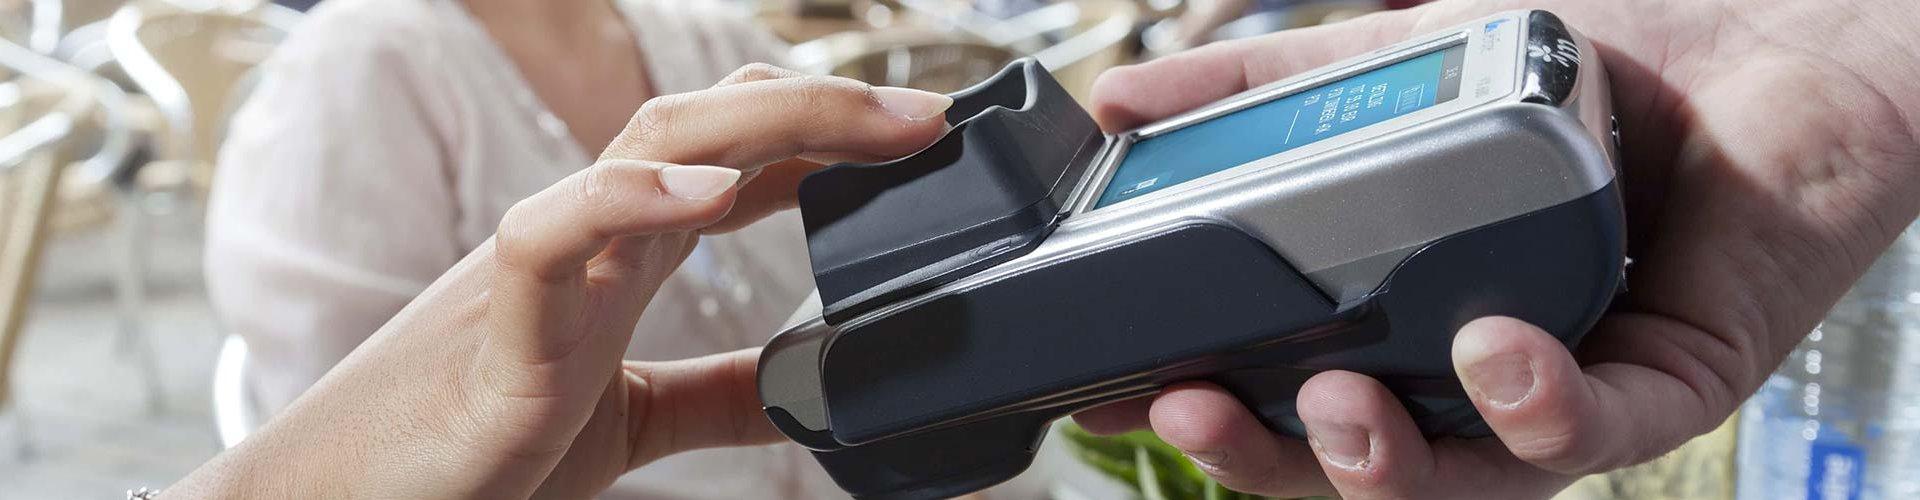 Mobiel pinnen Vx680 GPRS